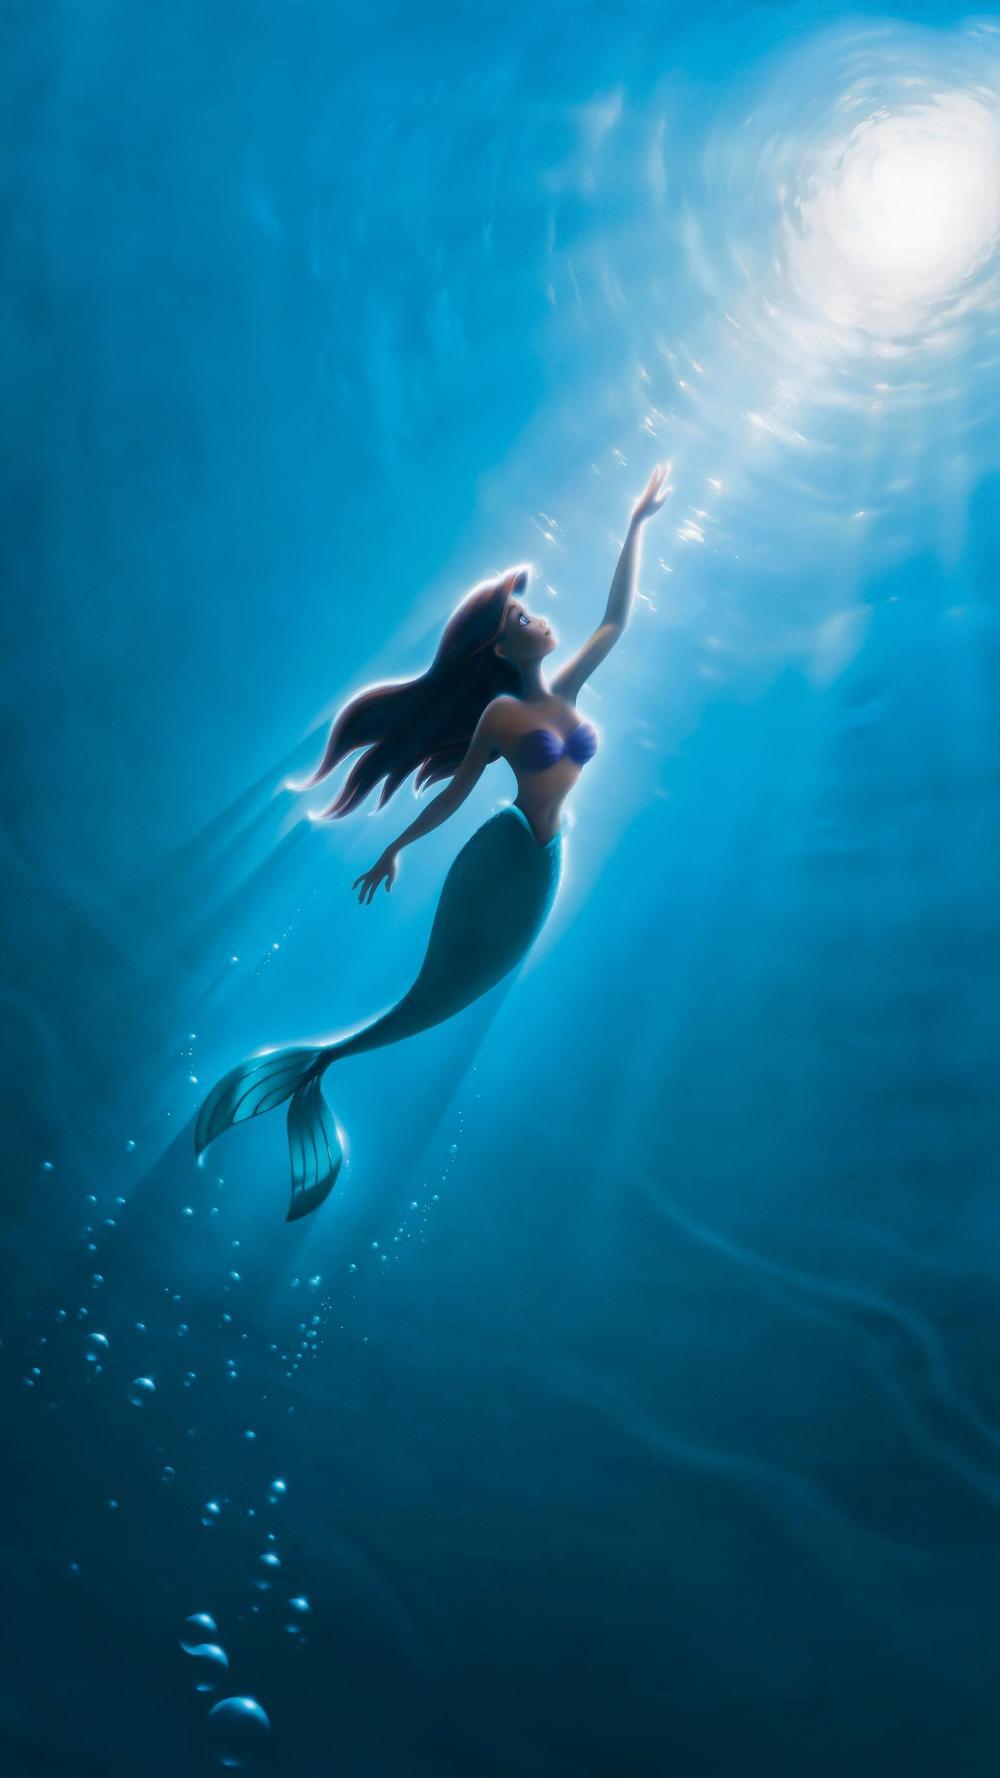 the-little-mermaid-phone-wallpaper